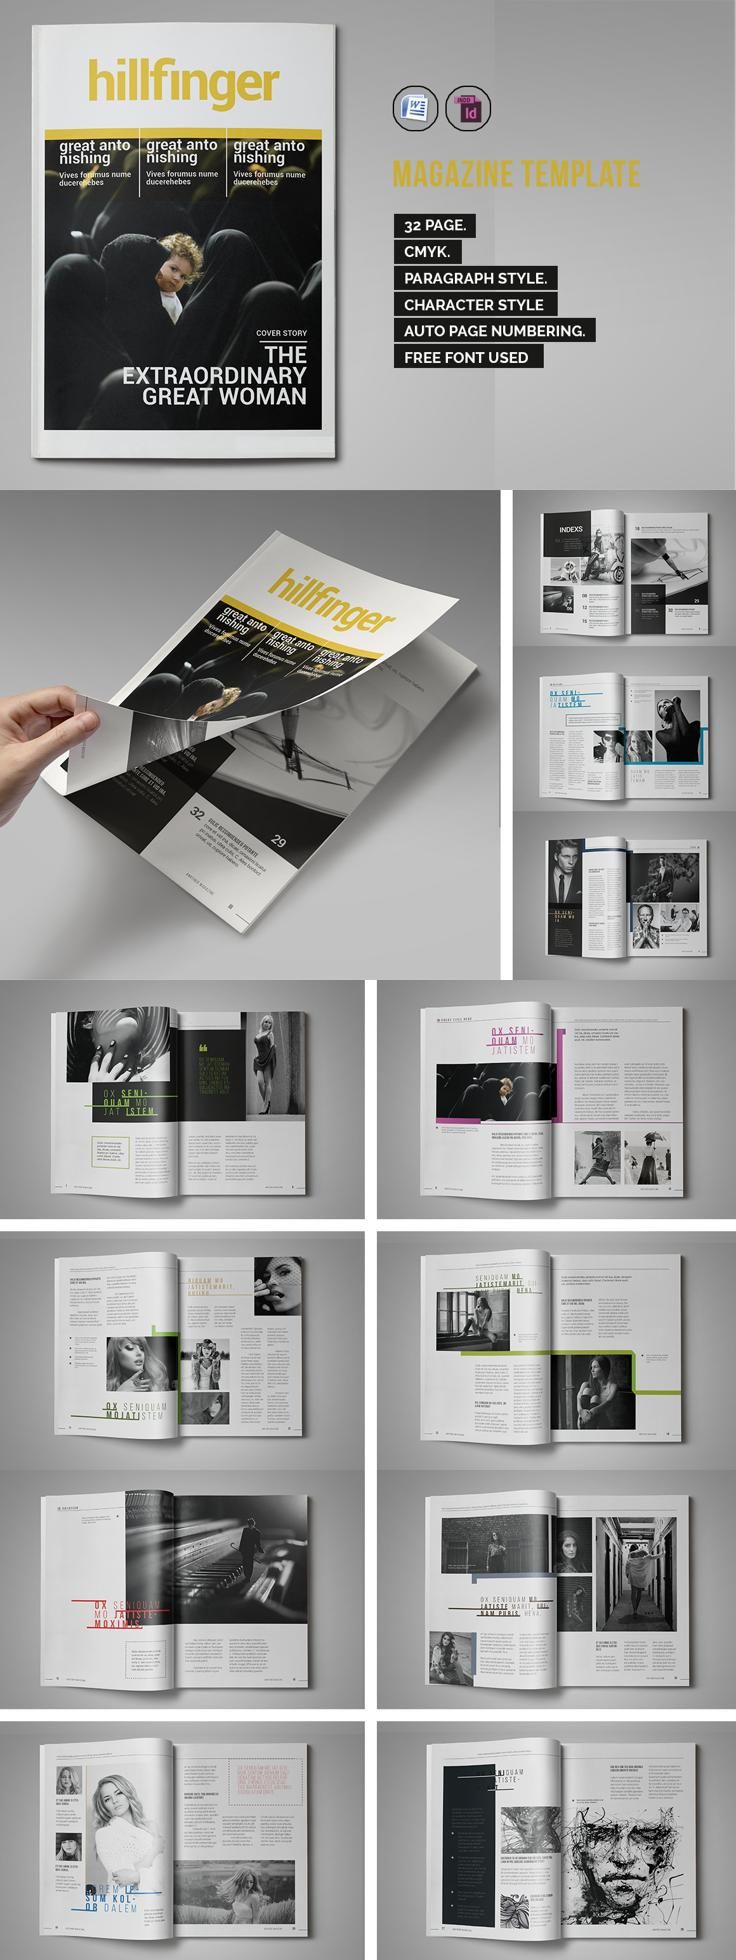 Magazine Design From Iwanraj